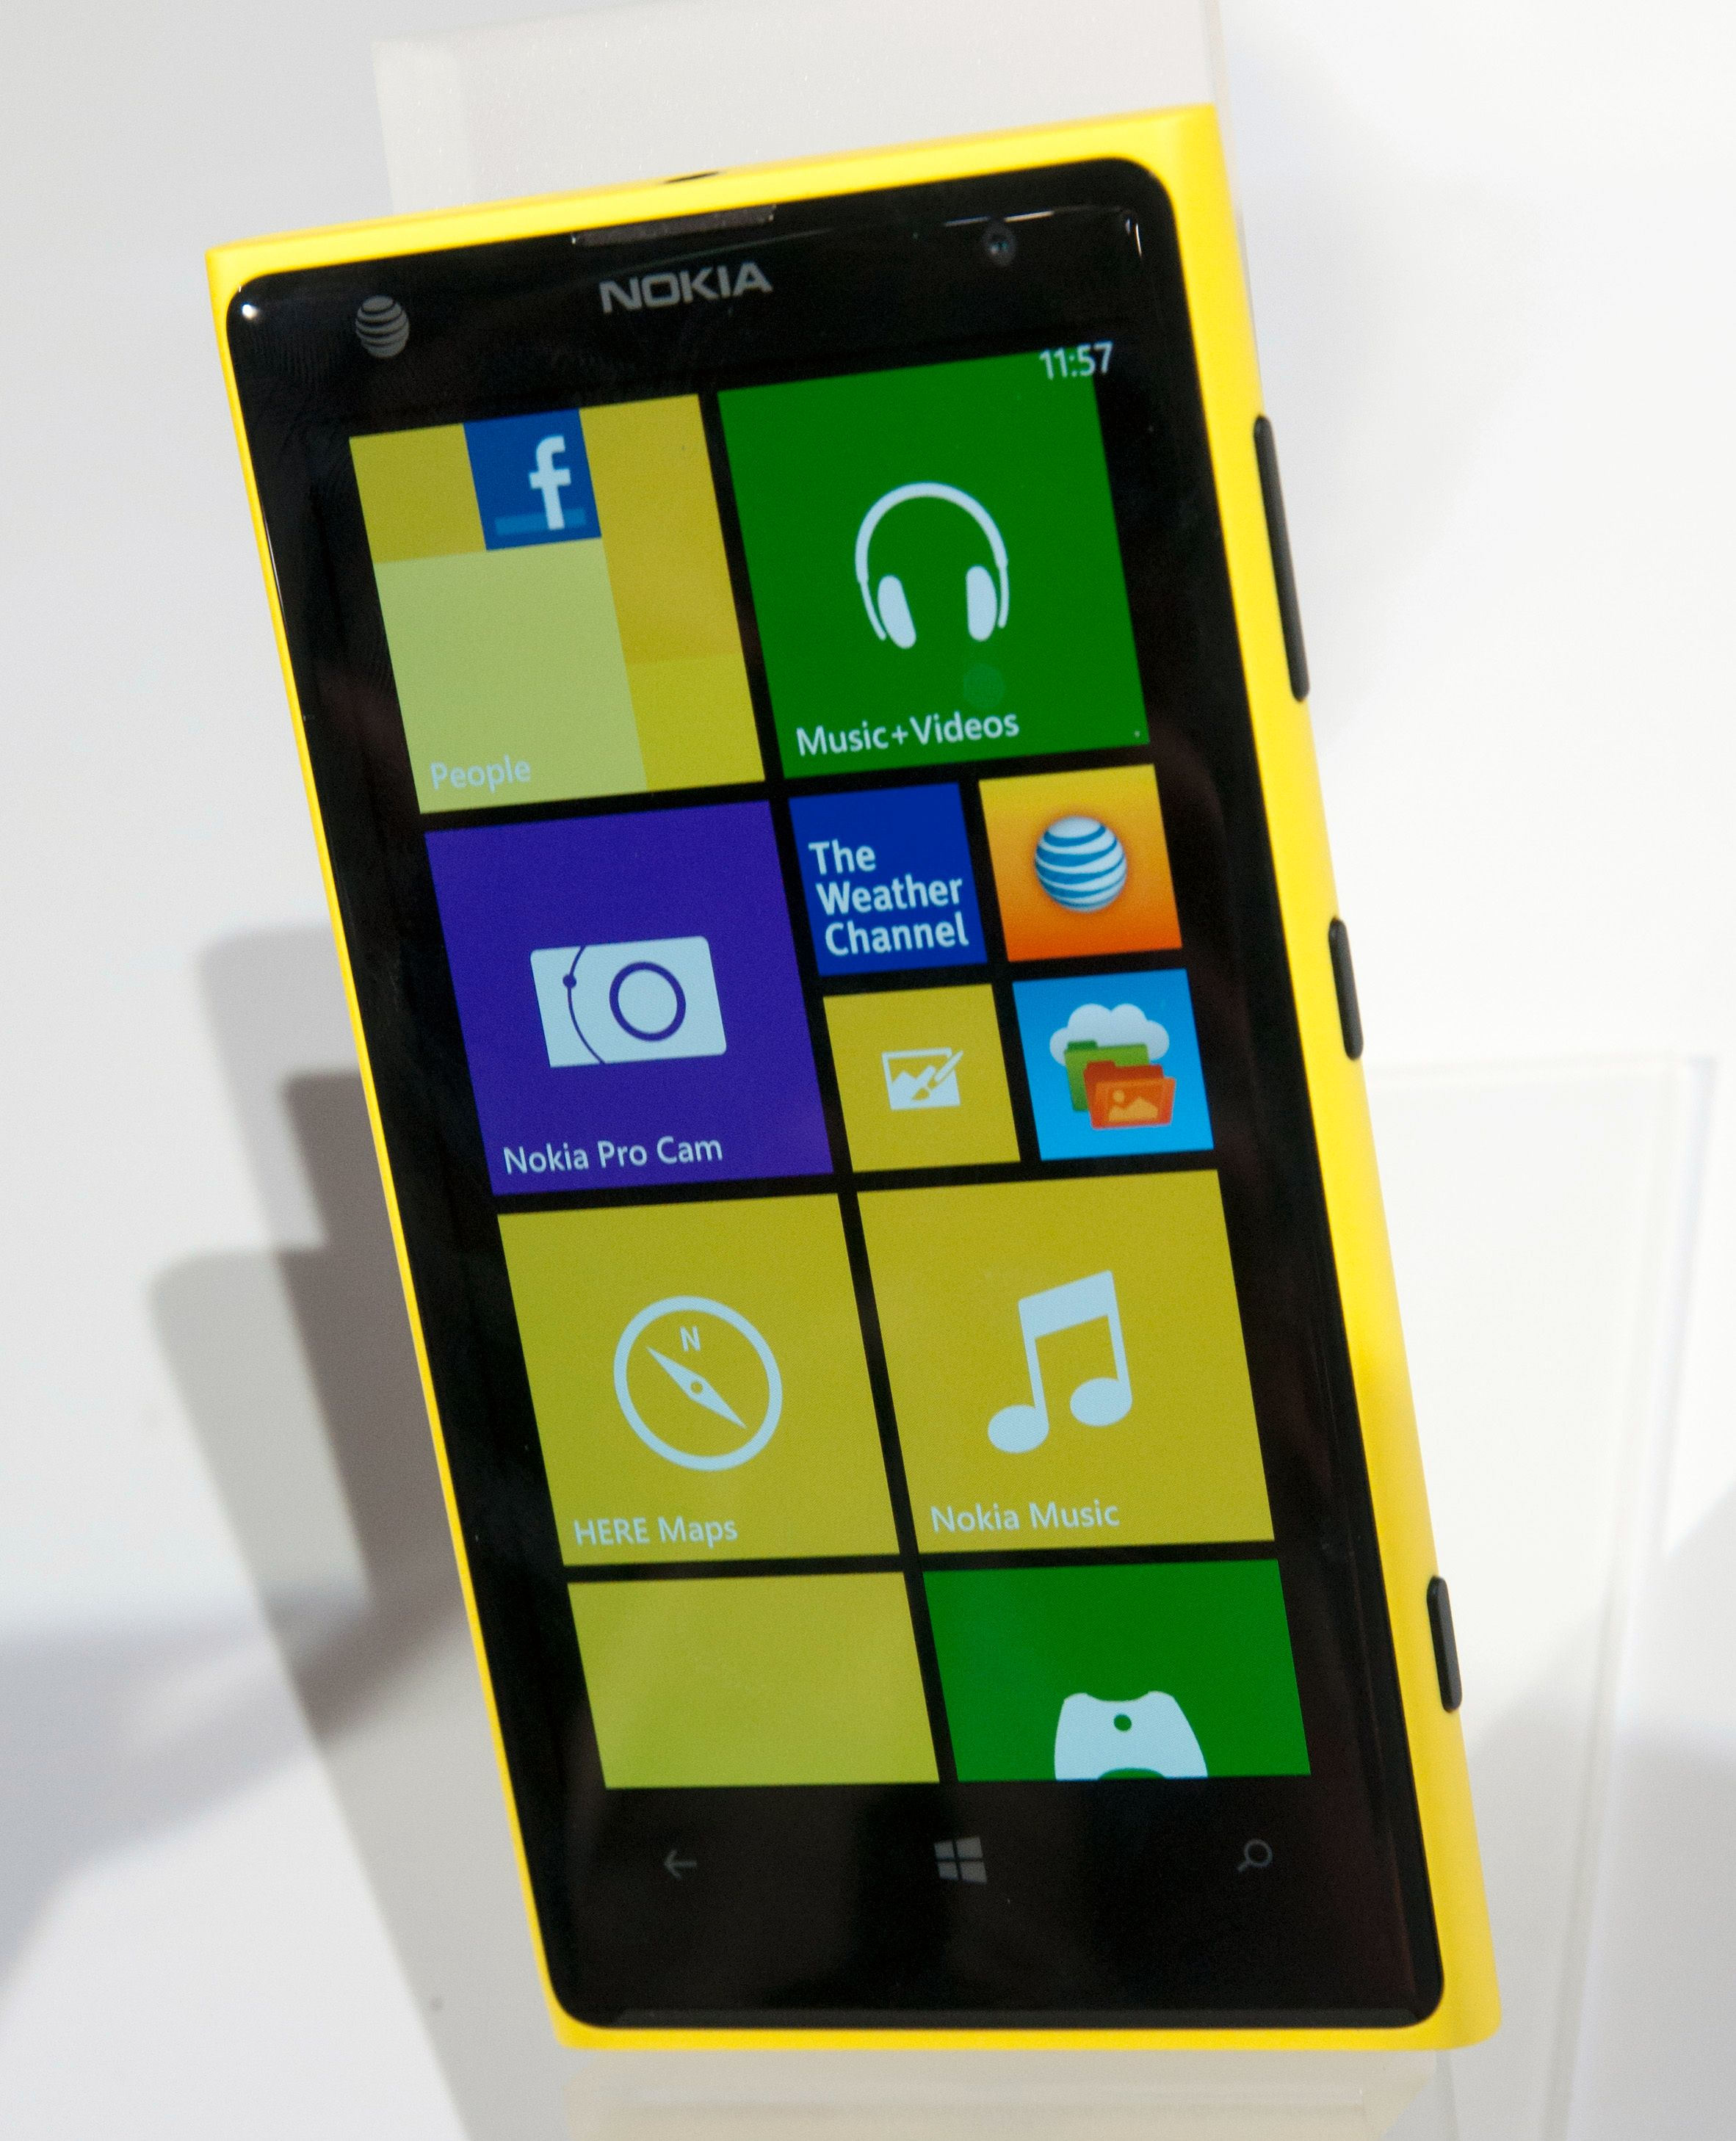 Nokia Lumia 1020 er greit synlig i terrenget i gul utgave.Foto: Finn Jarle Kvalheim, Amobil.no